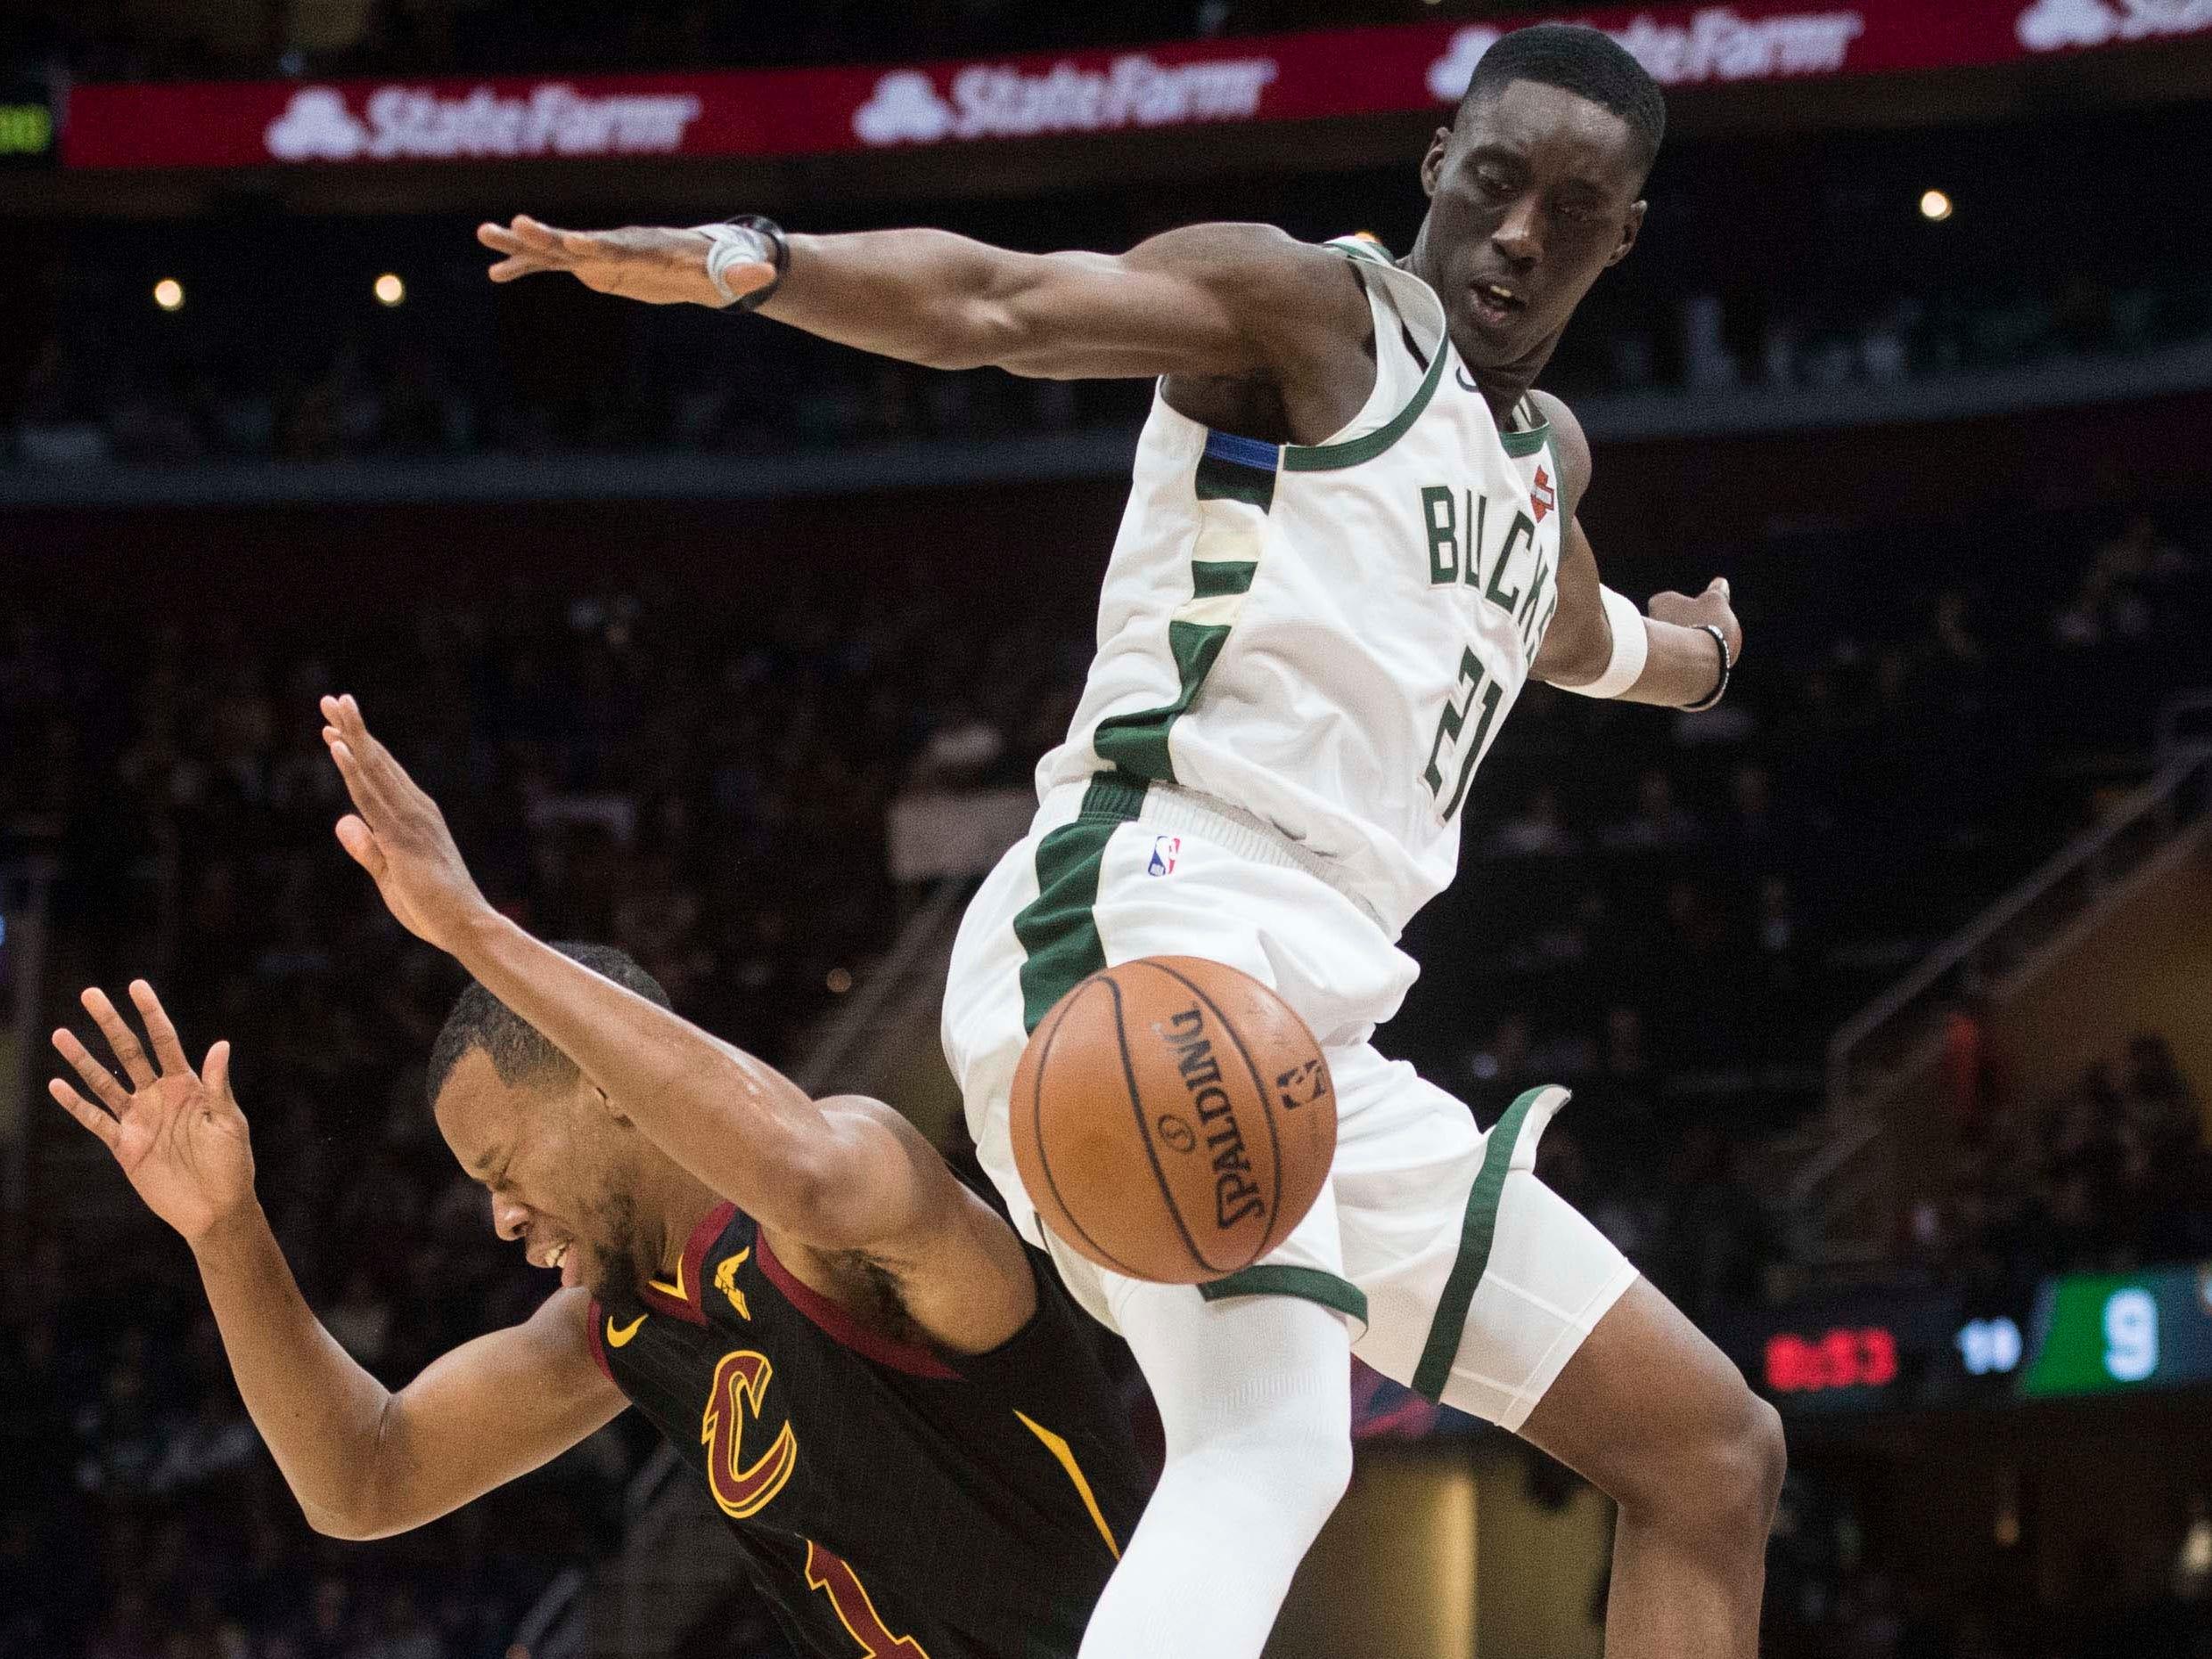 Bucks guard Tony Snell fouls Cleveland Cavaliers guard Rodney Hood.